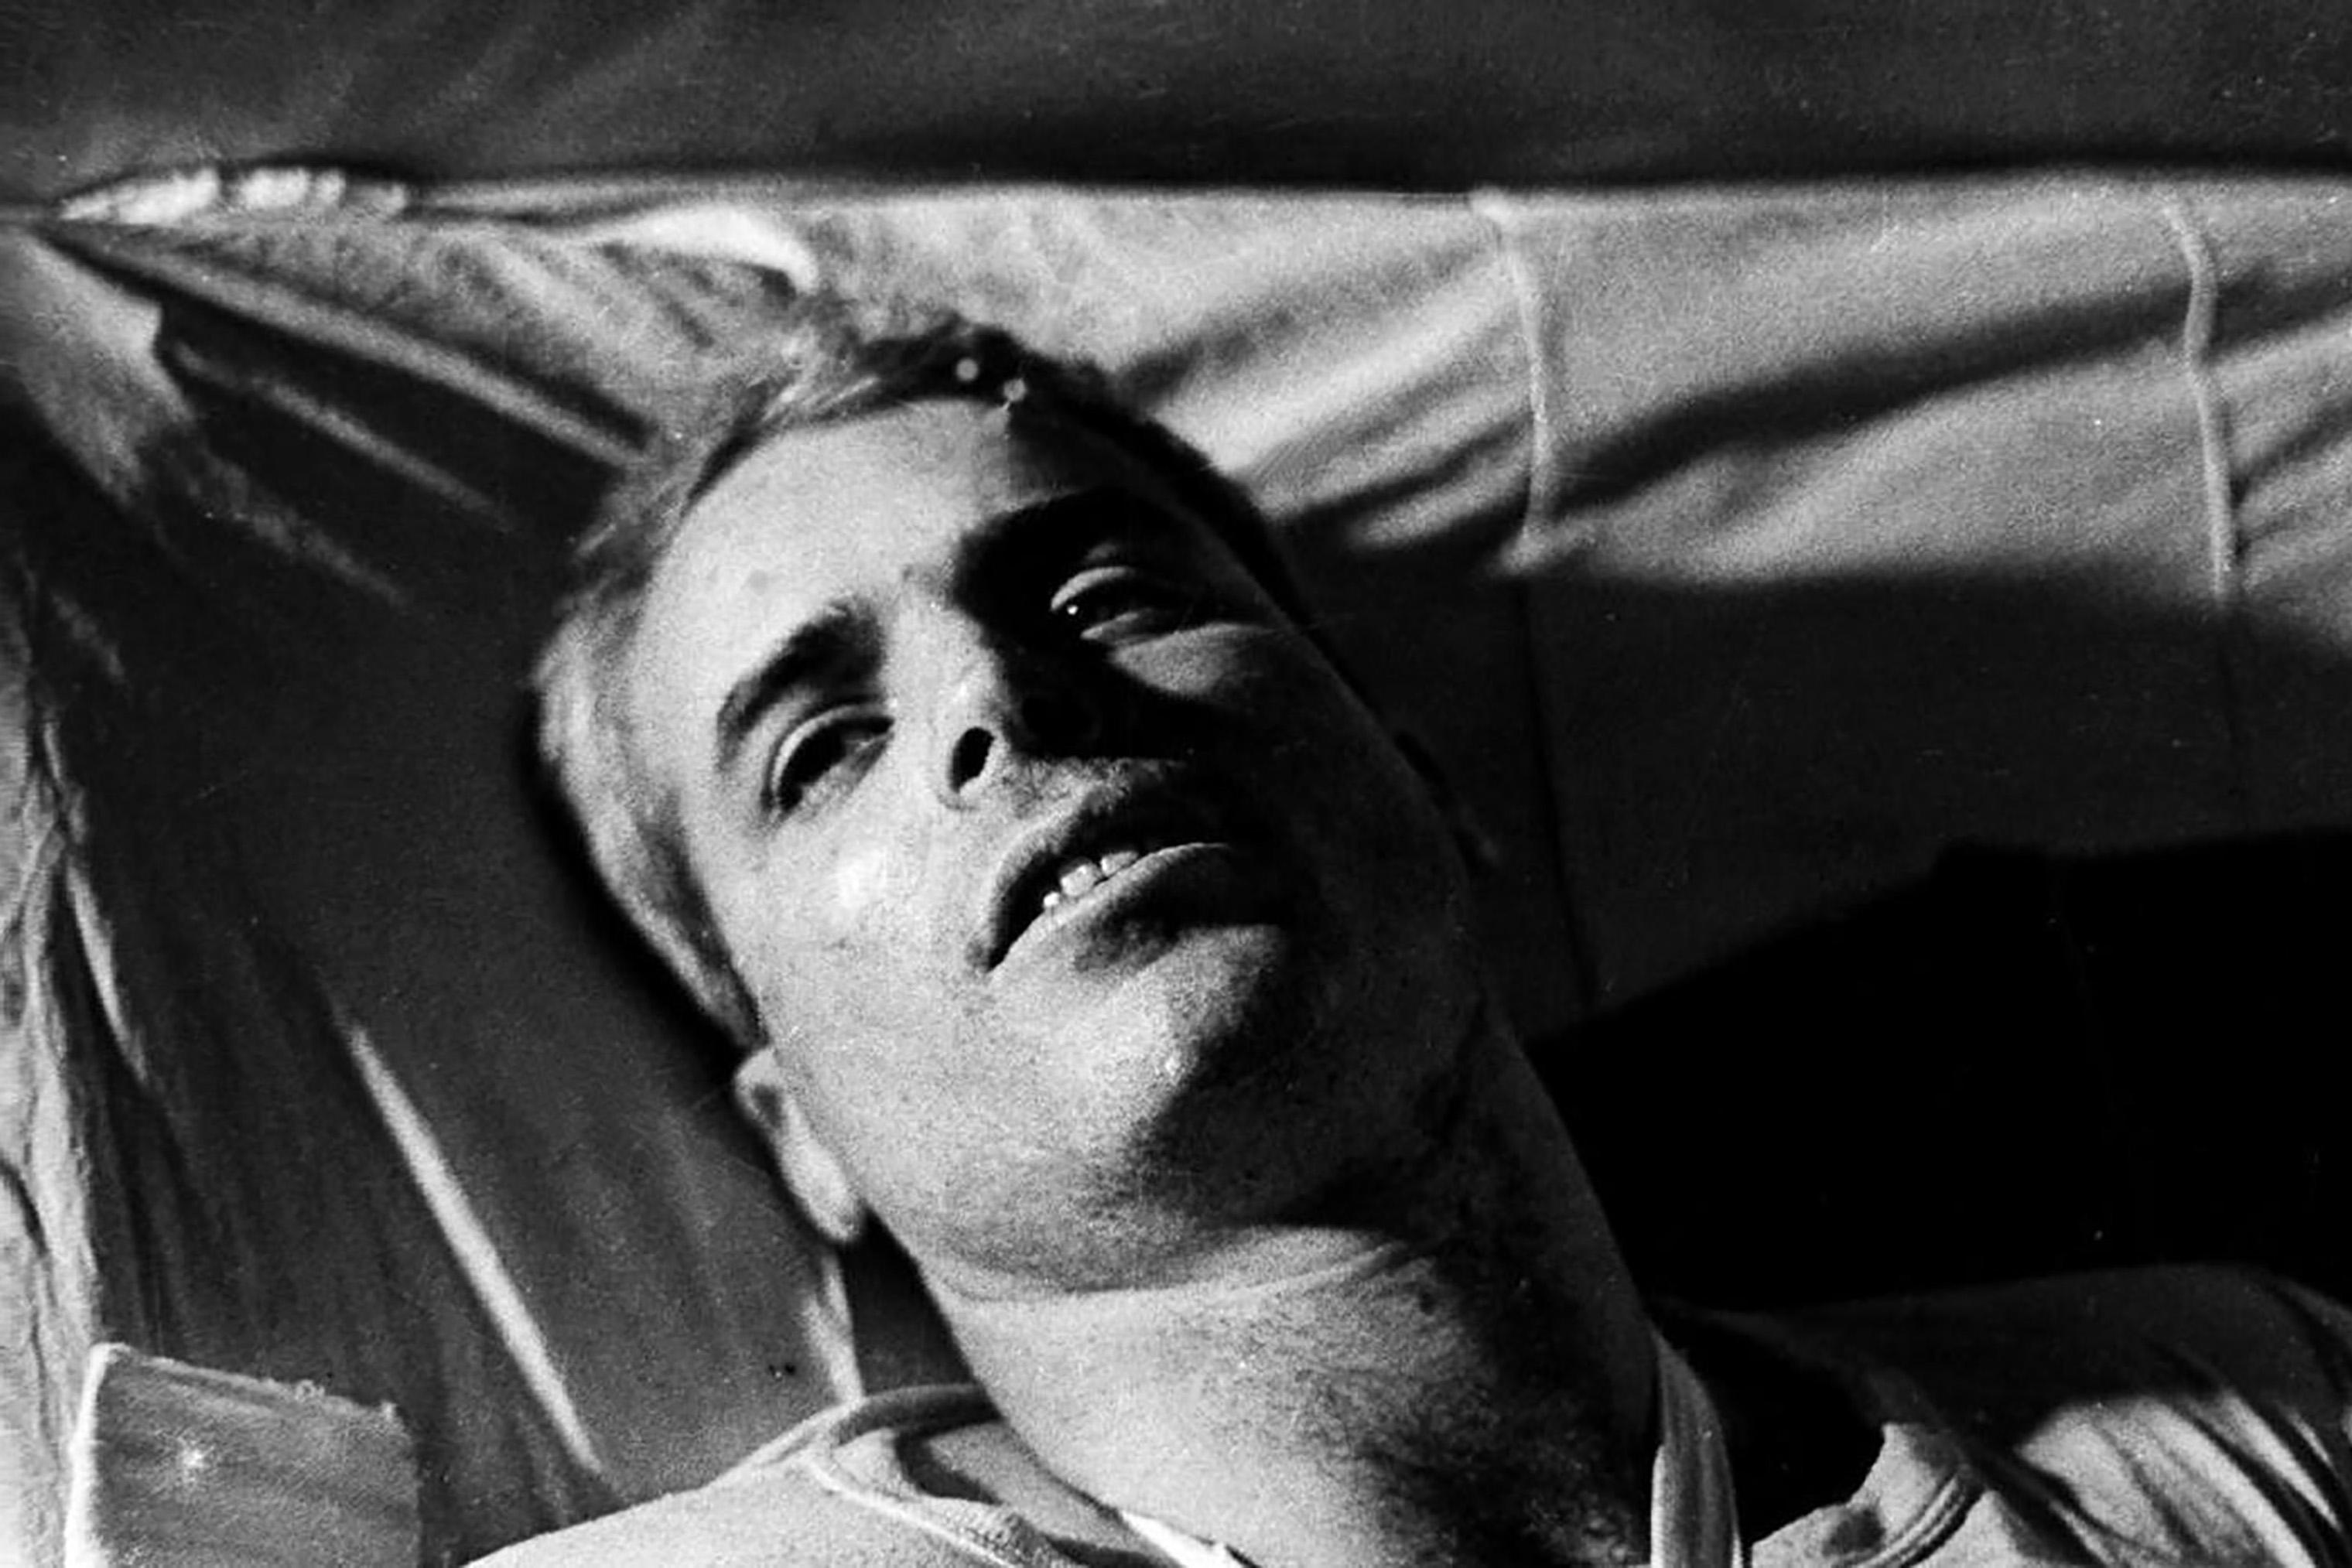 Then Navy Lieutenant Commander John McCain lying on a bed in a hospital in Hanoi, Vietnam in 1967.